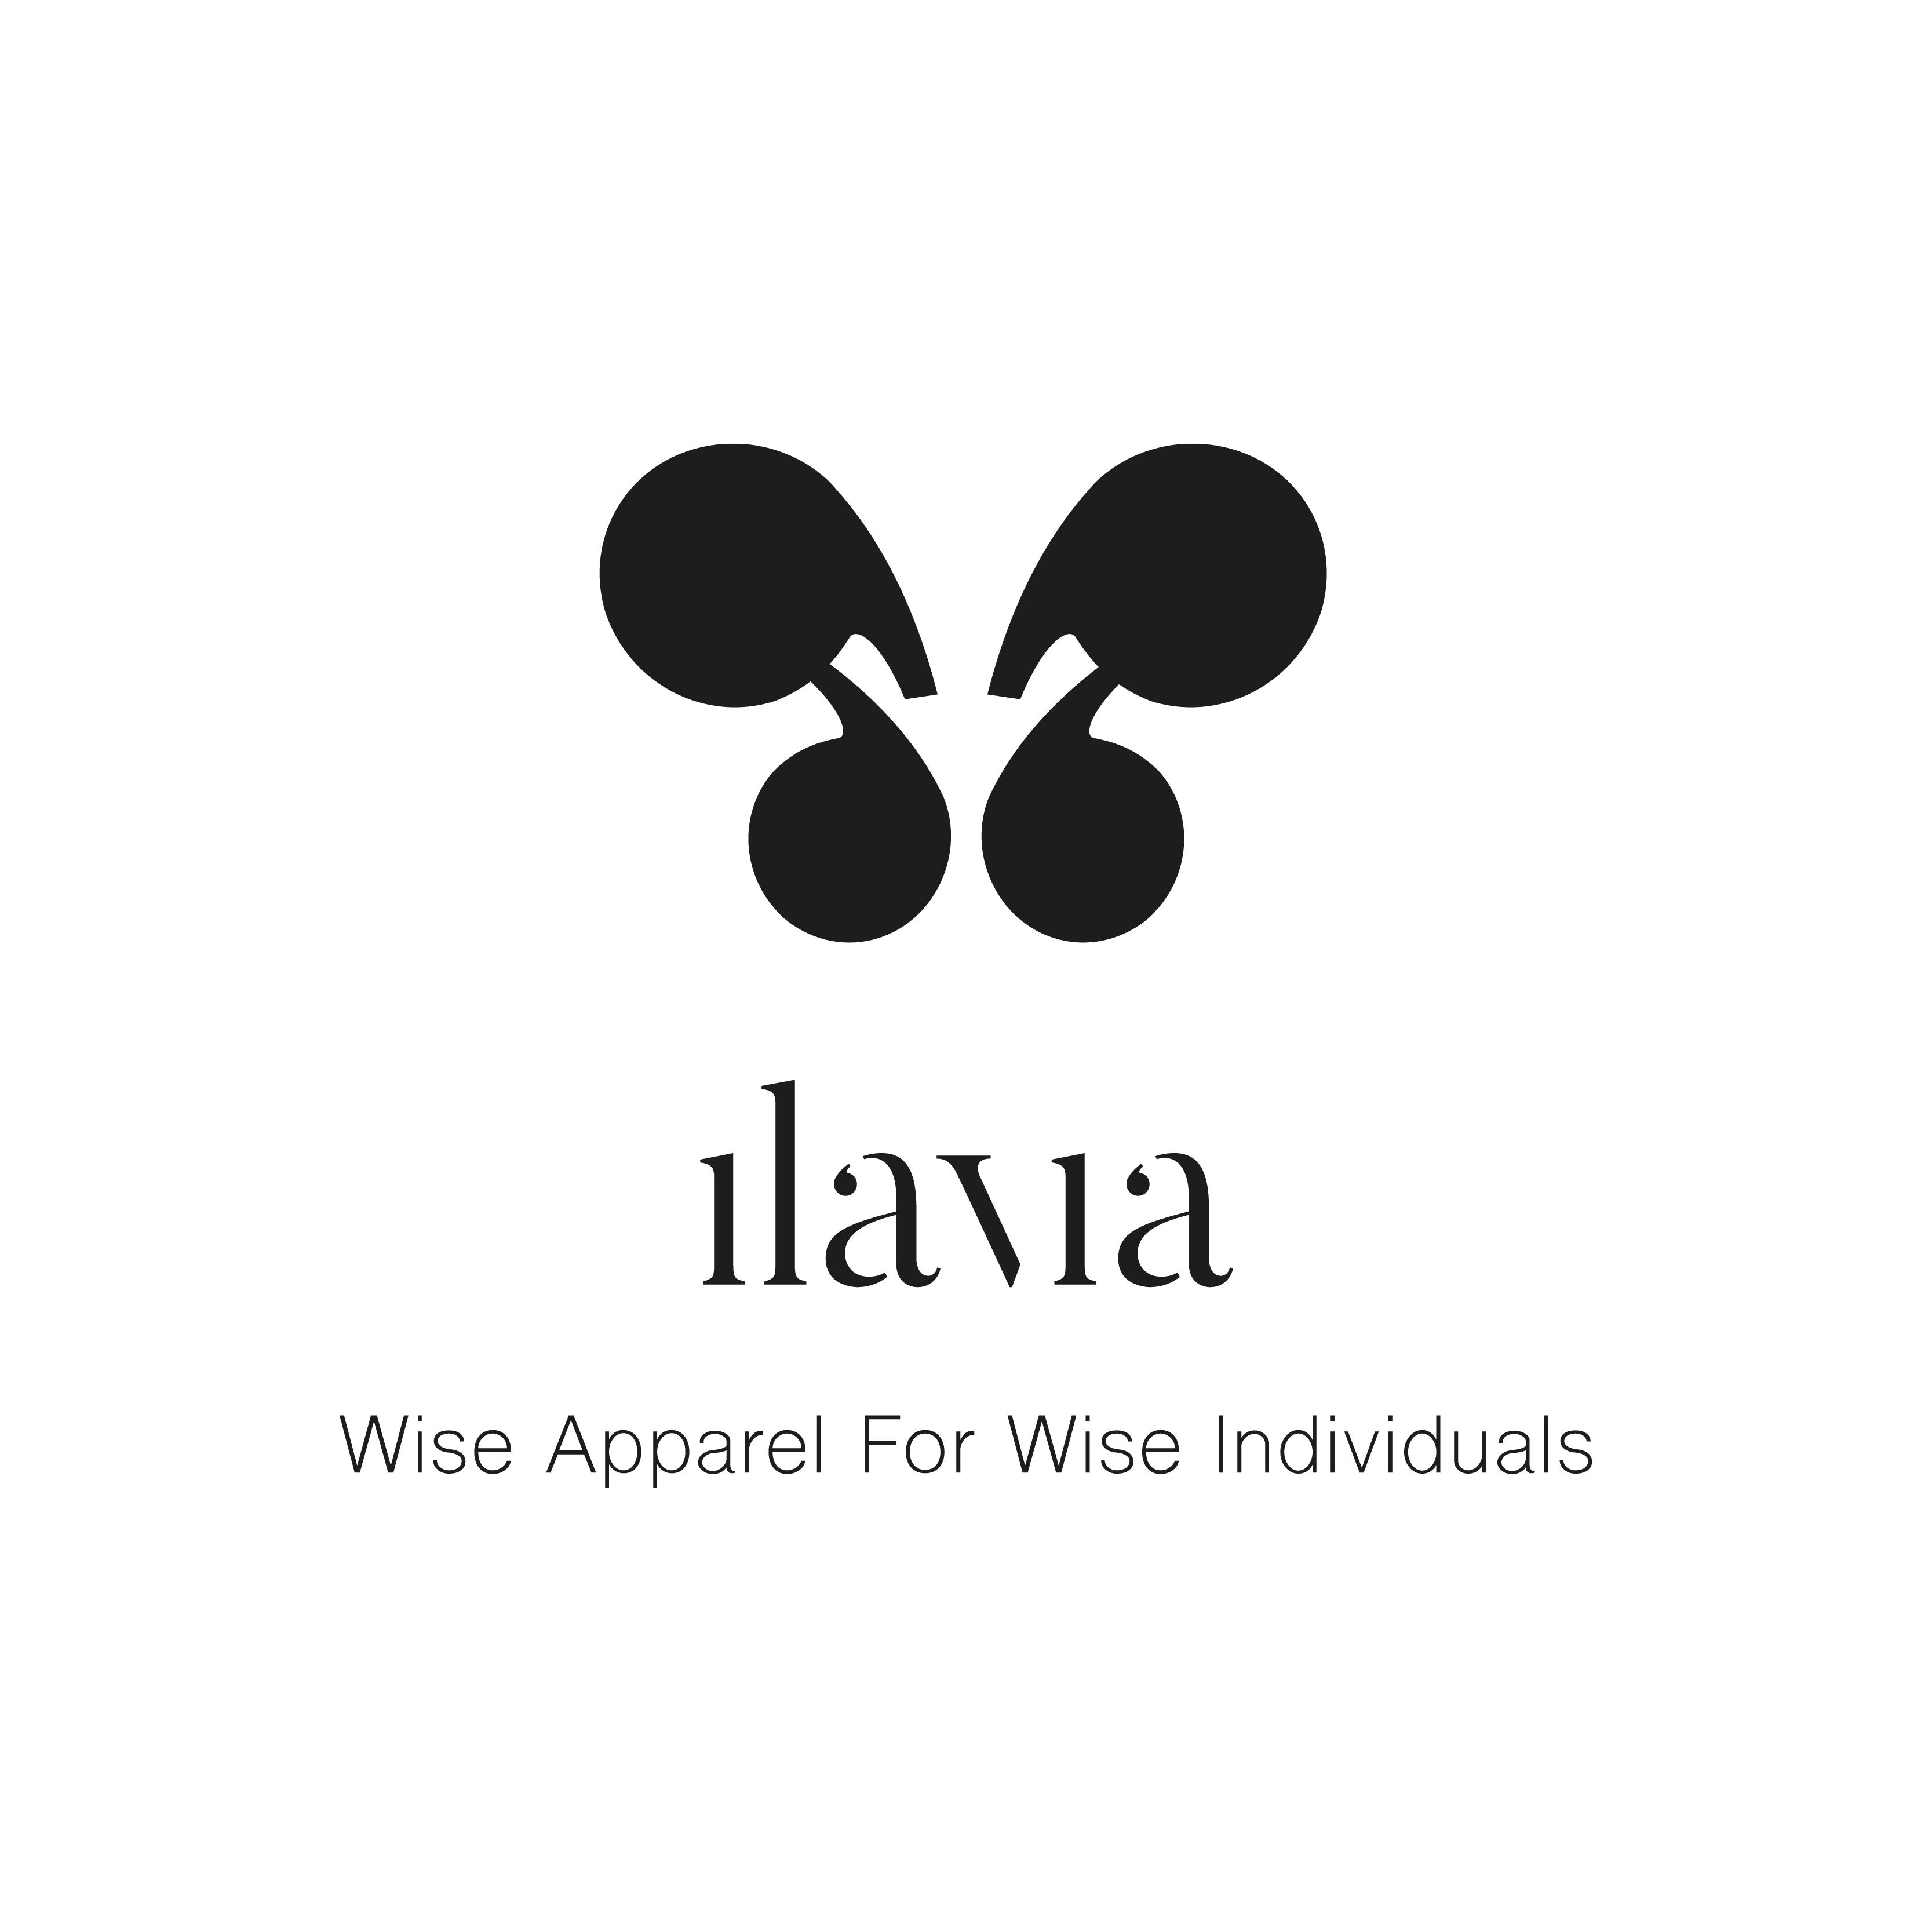 ilavia_logo_andydoteeu-01